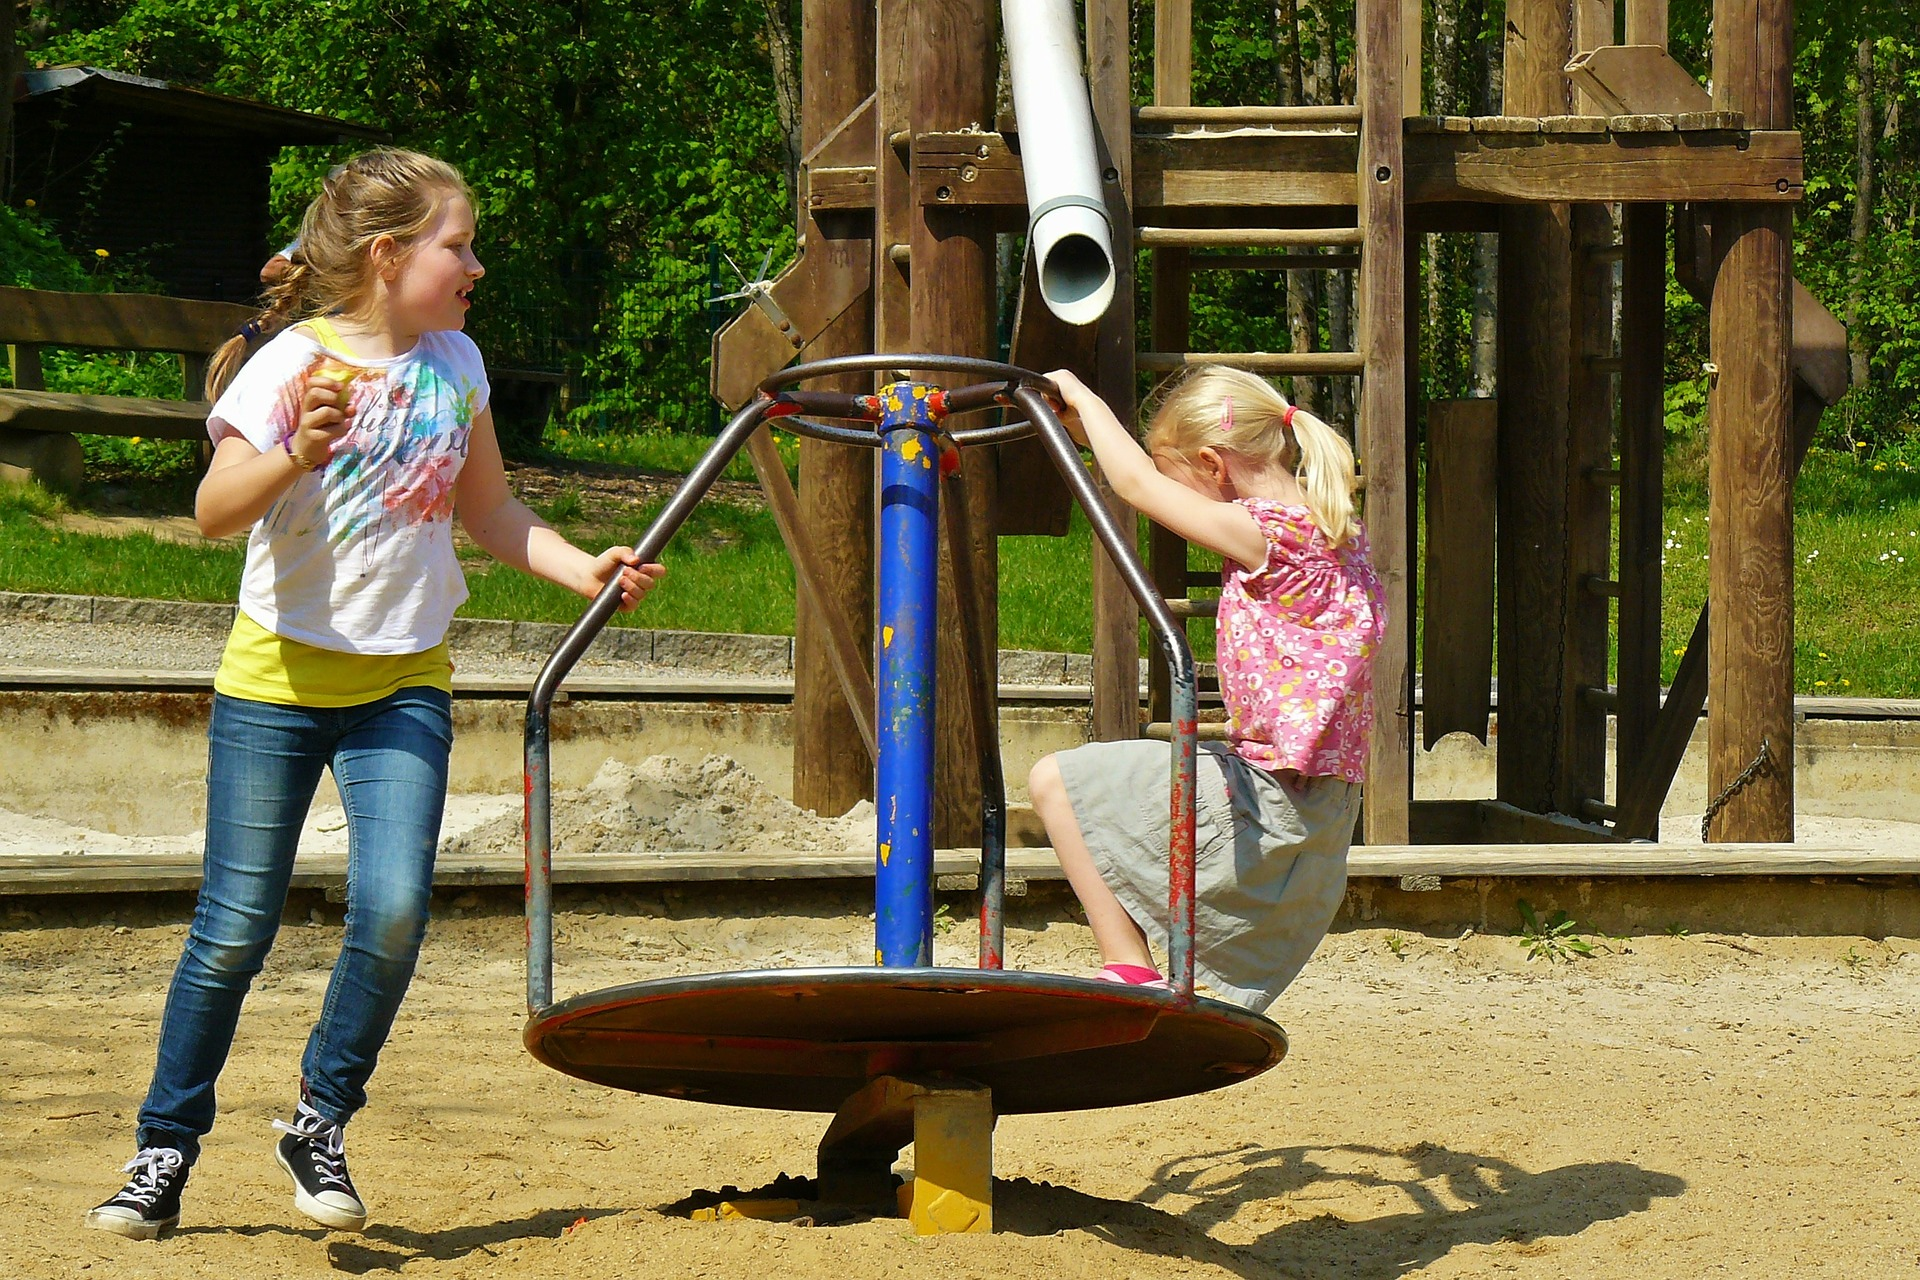 children-playing-334531_1920